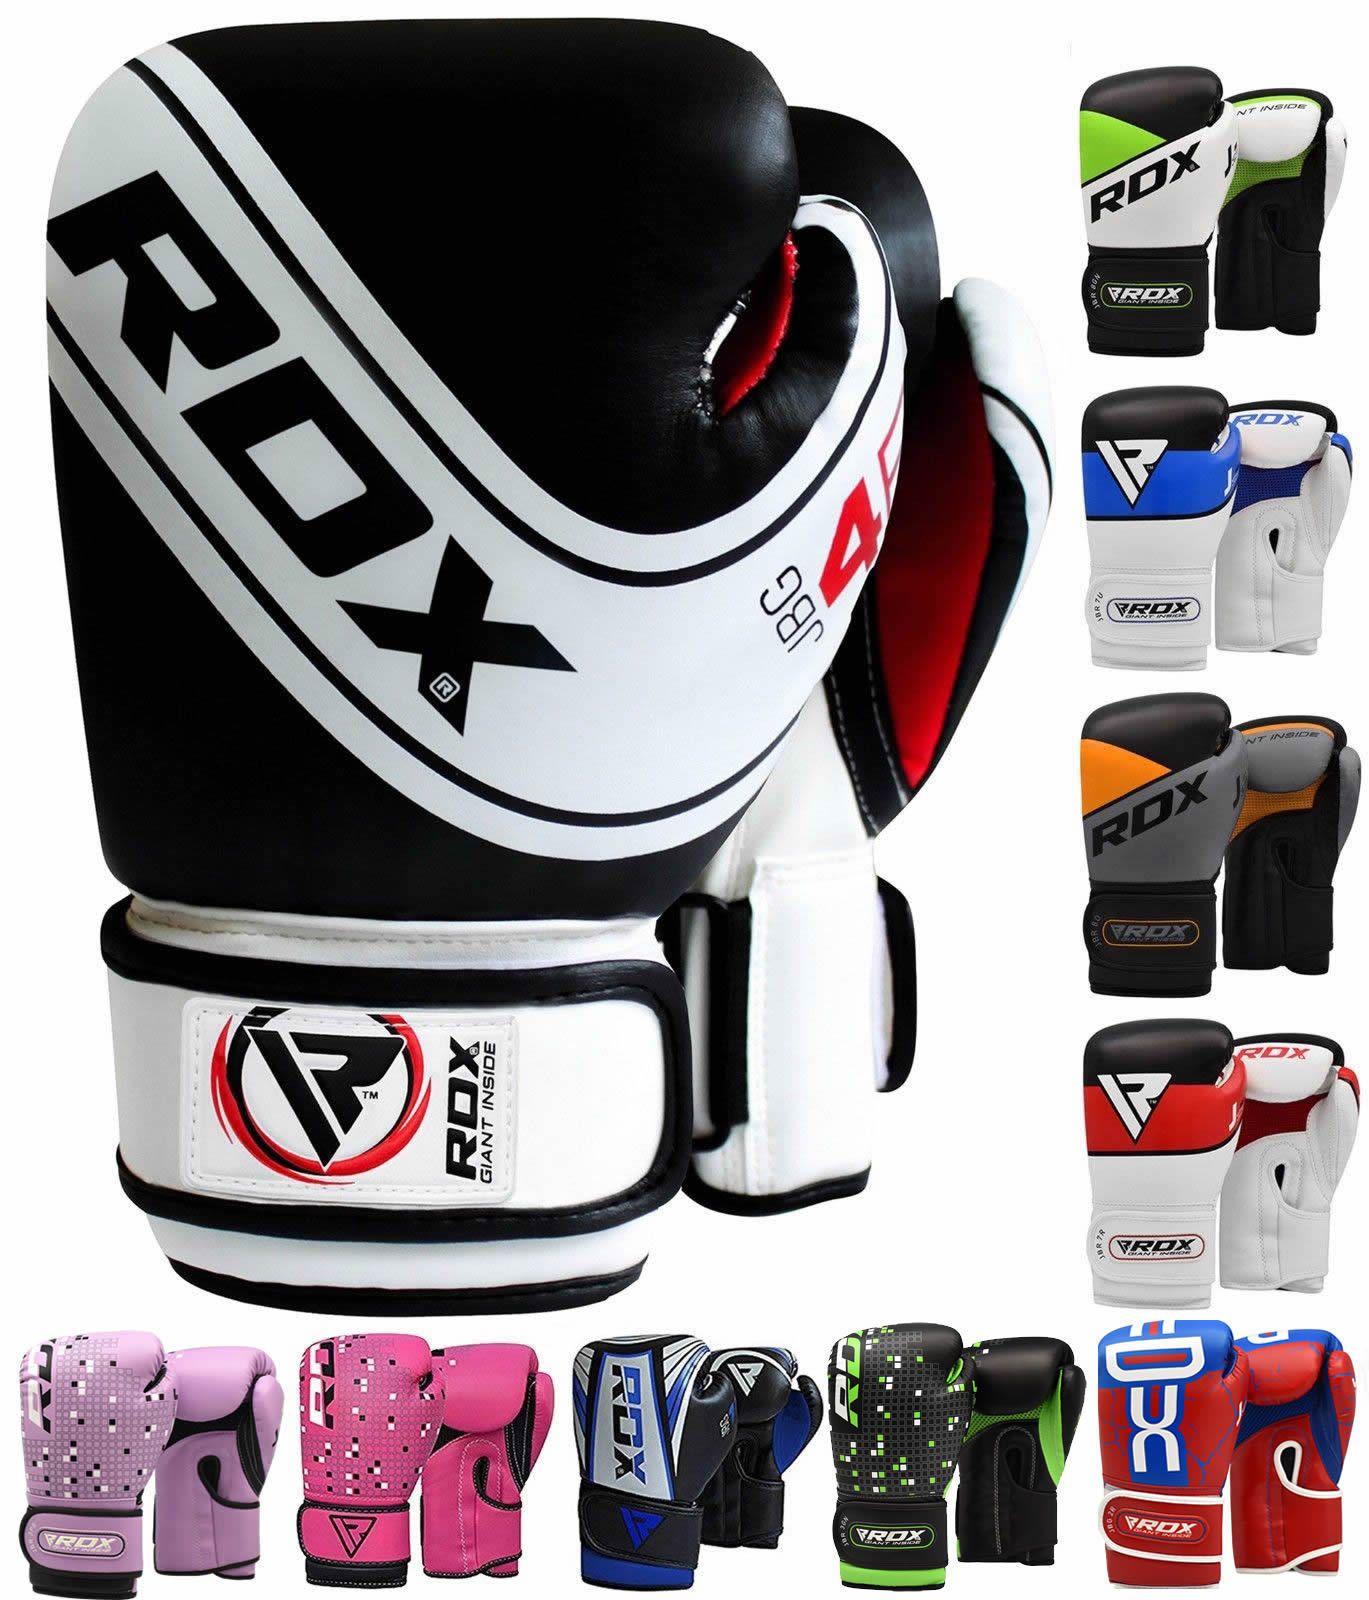 RDX Kids Boxing Gloves Junior Punching Bag Mitts MMA Muay thai Training Sparring